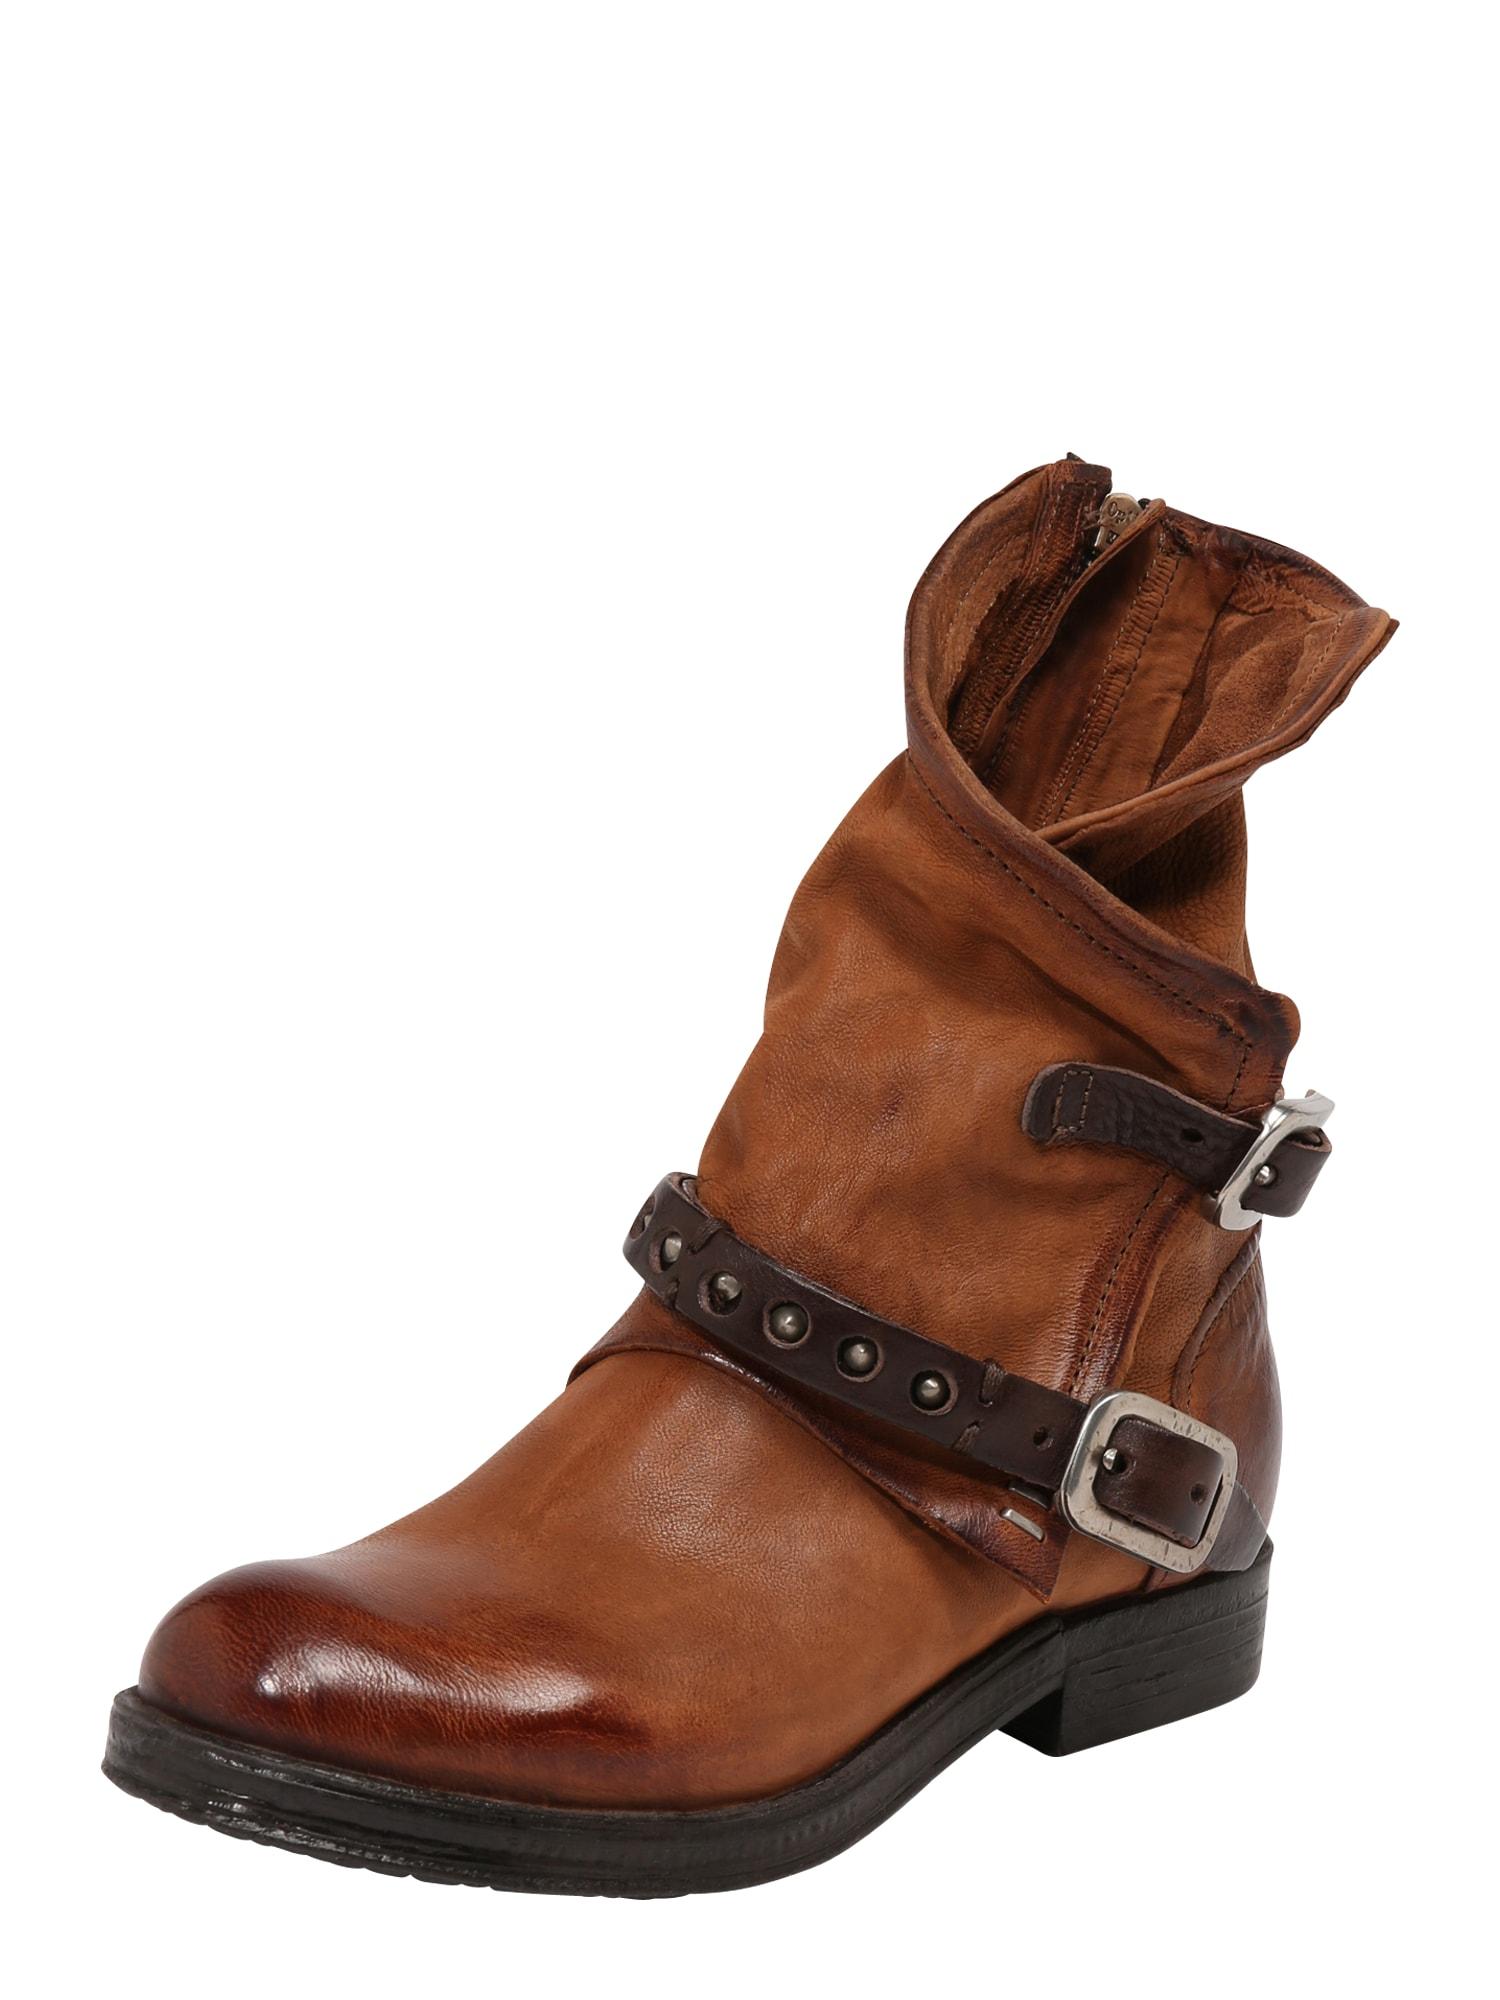 A.S.98 Auliniai batai ruda (konjako)